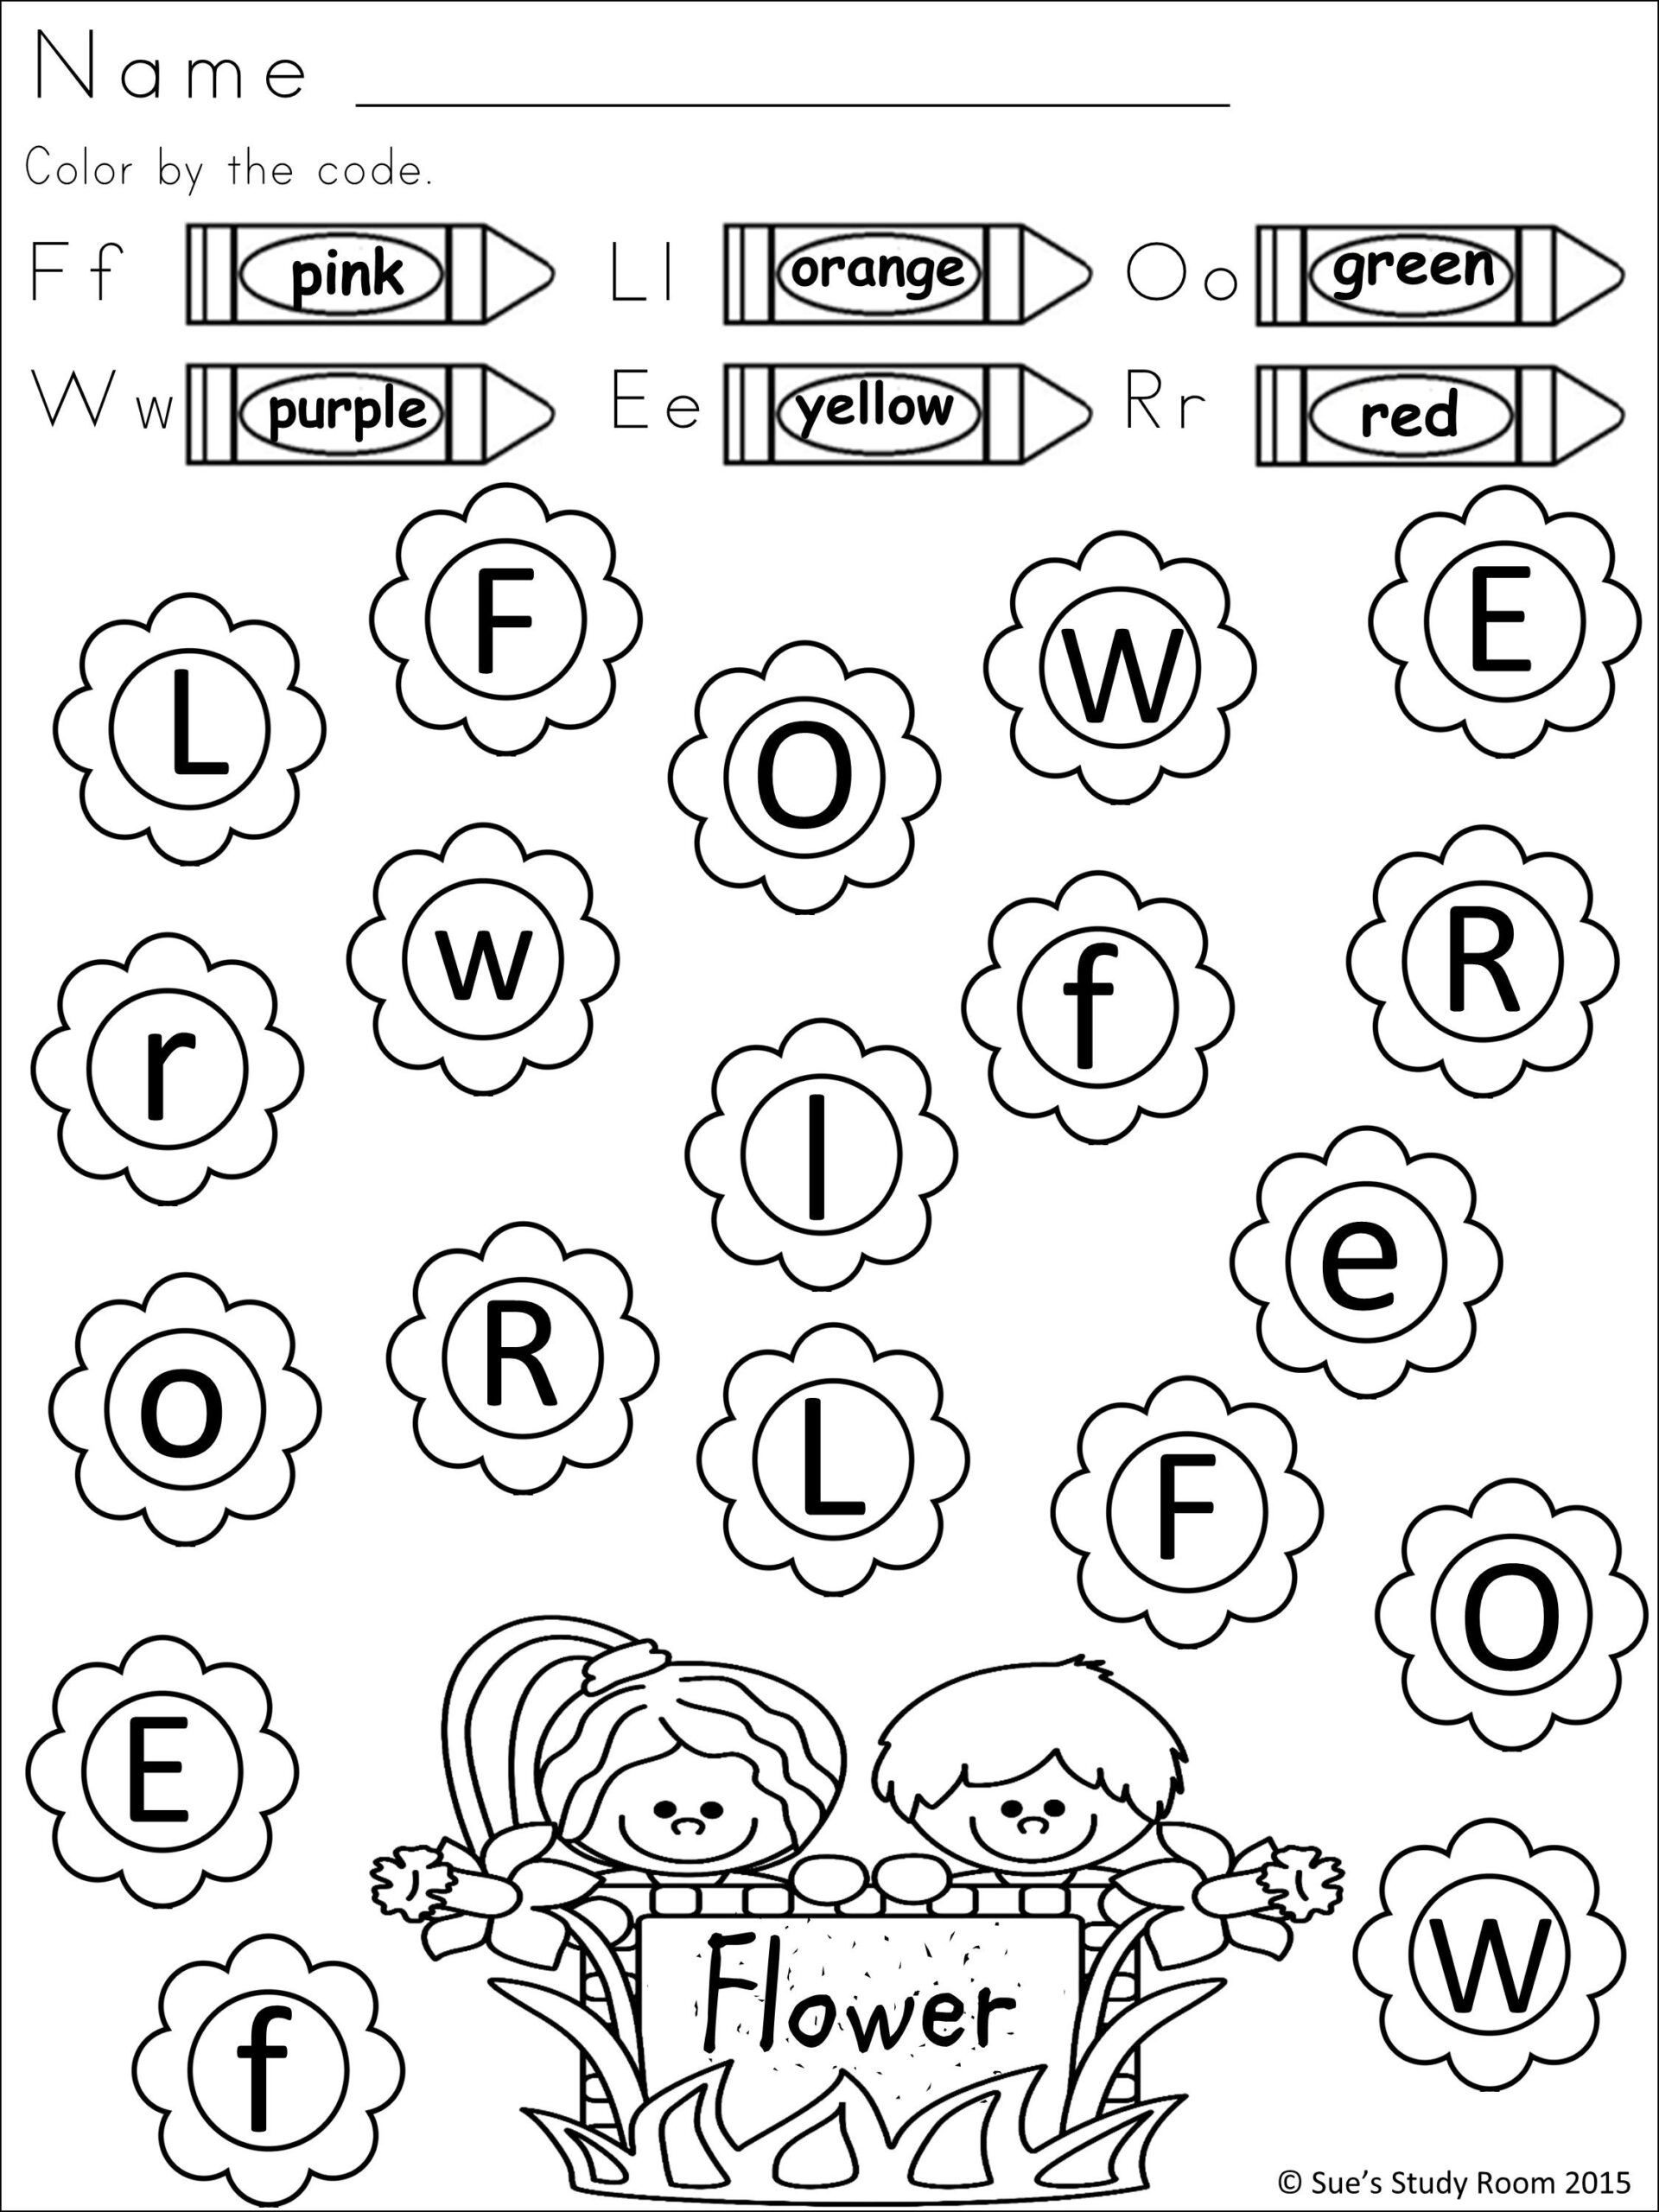 Preschool Letter Recognition Worksheets Worksheet Fun Facts regarding Alphabet Recognition Worksheets For Preschool